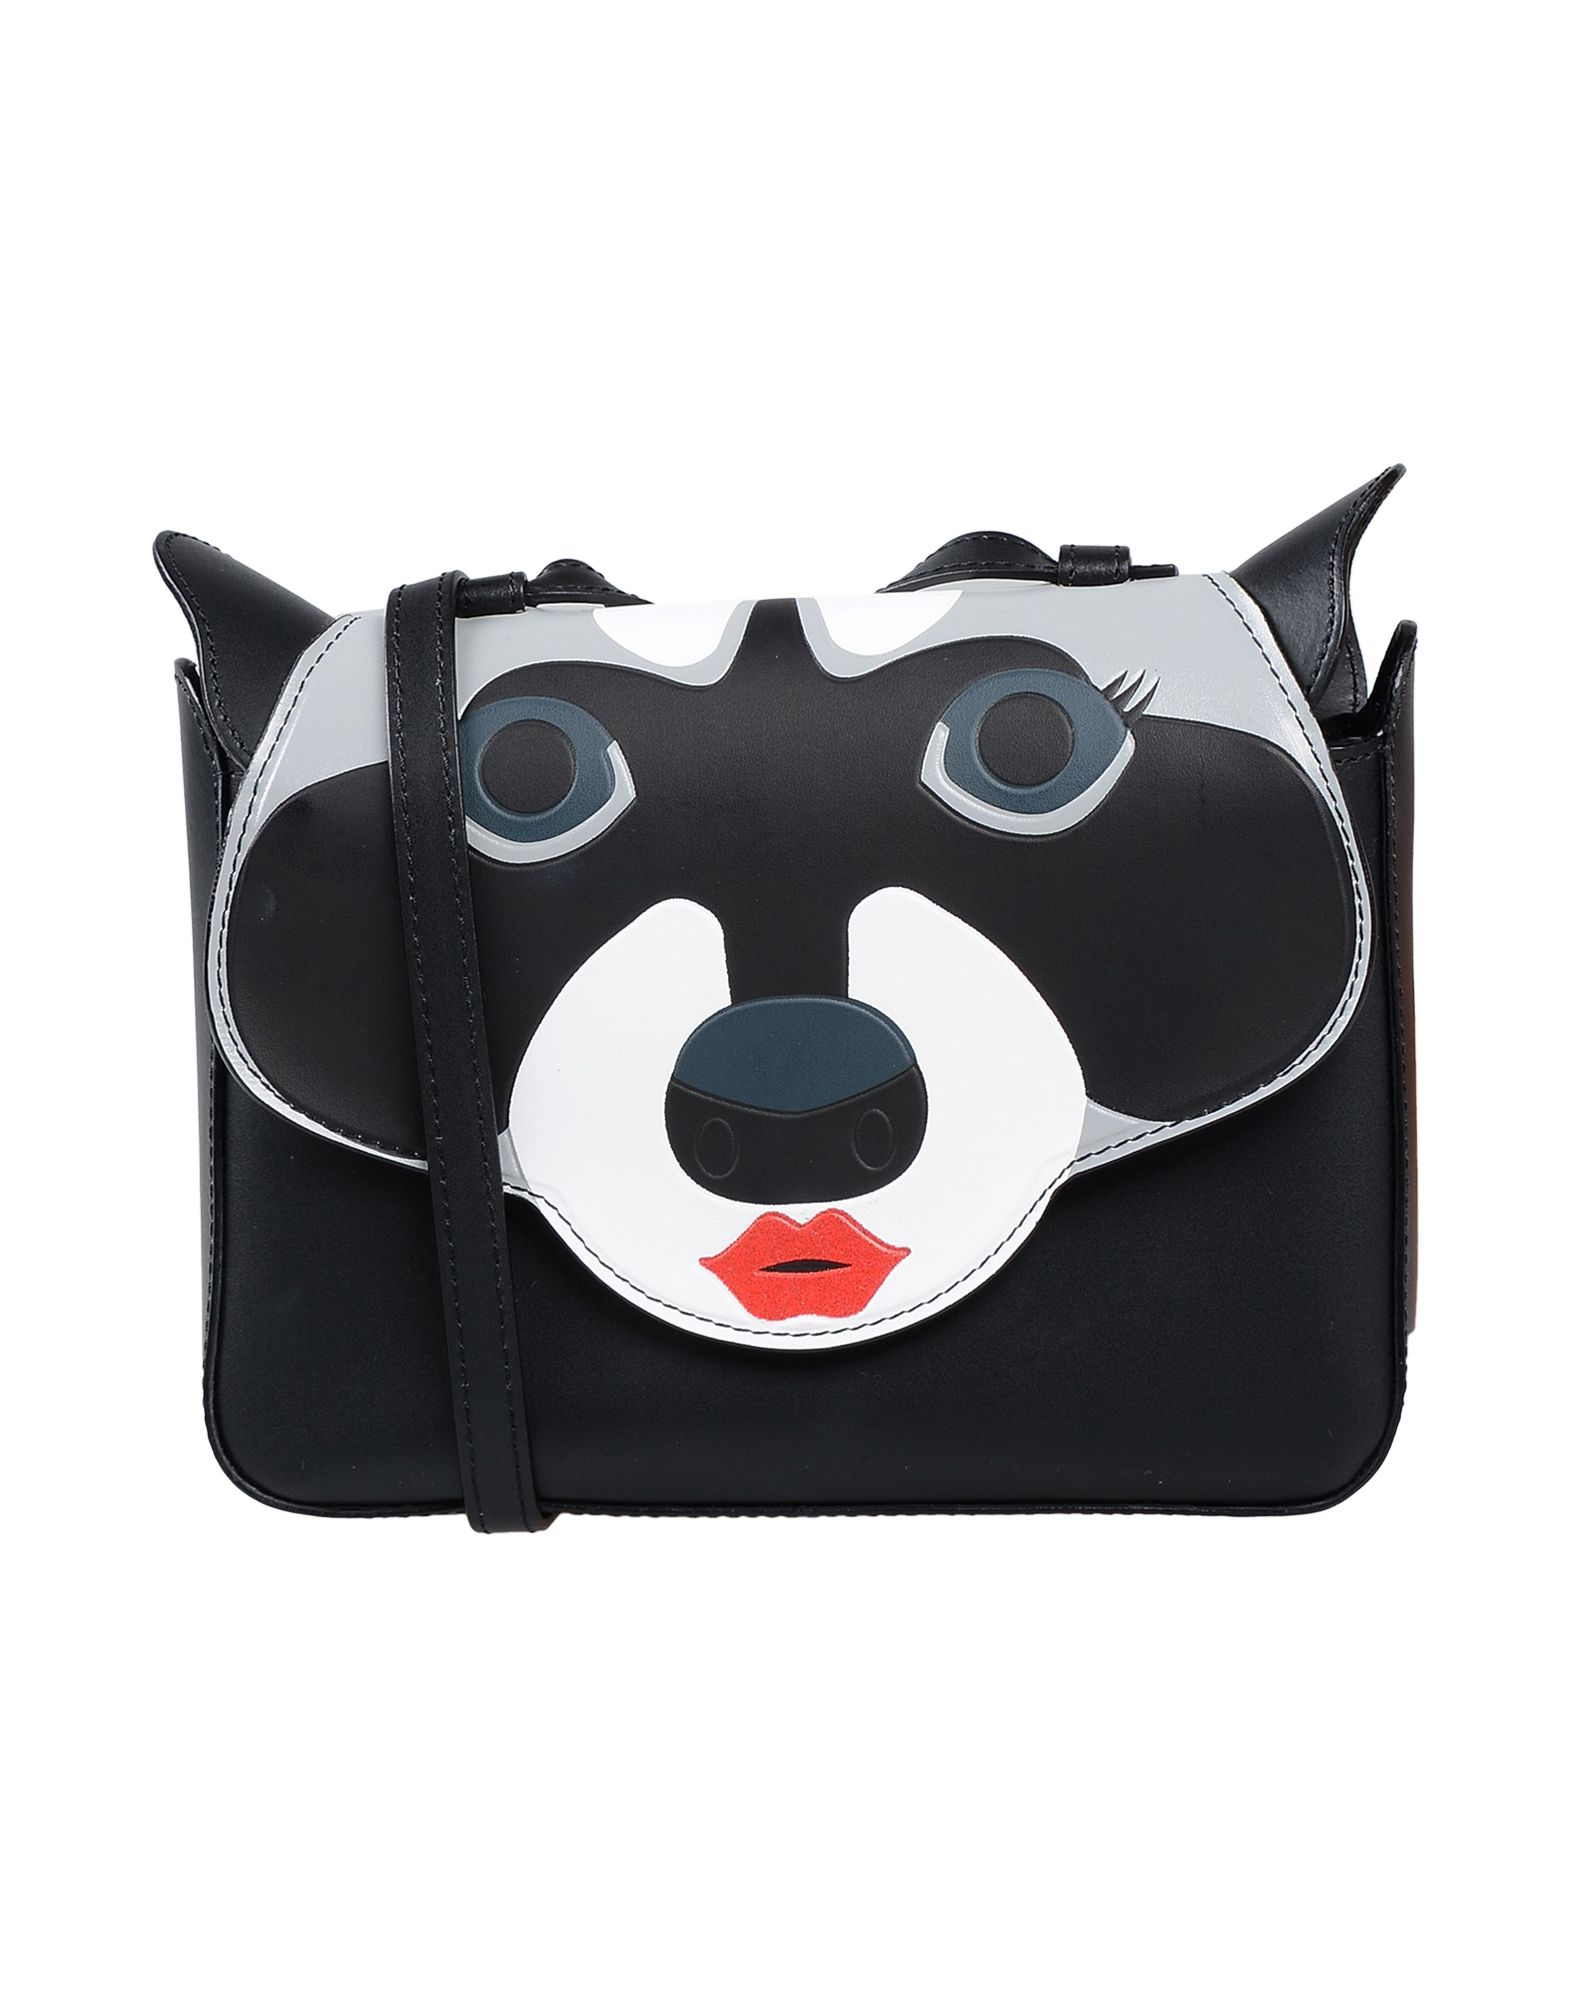 feger мужская сумка через плечо стоячий рюкзак спортивная сумка на поясе V°73 Сумка через плечо